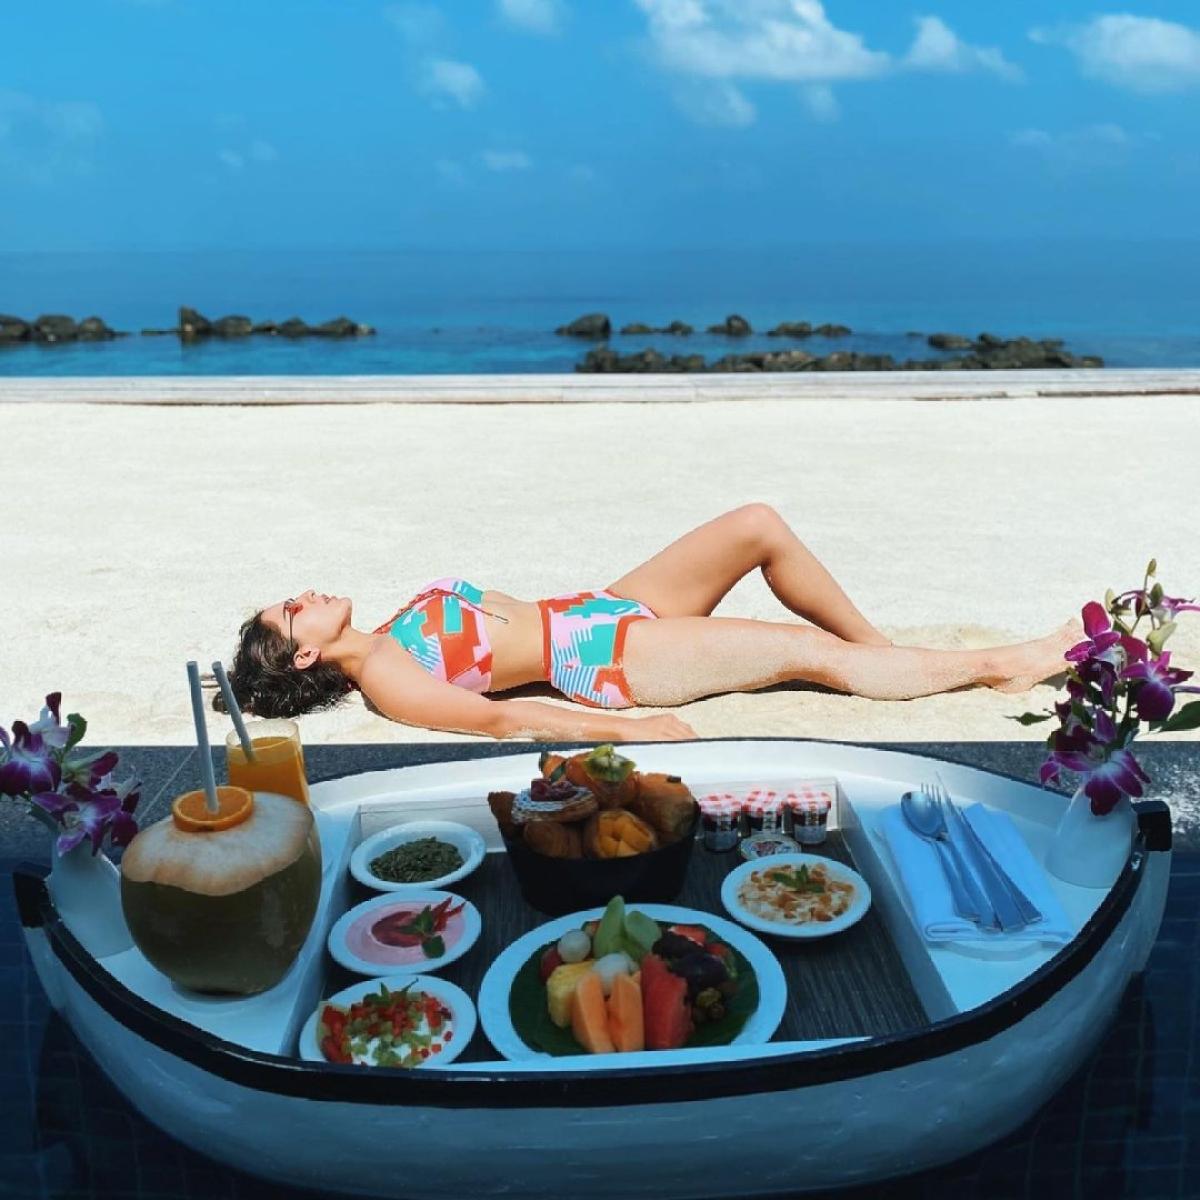 Sara Ali Khan stuns in a bikini, enjoys floating breakfast during Maldives vacay